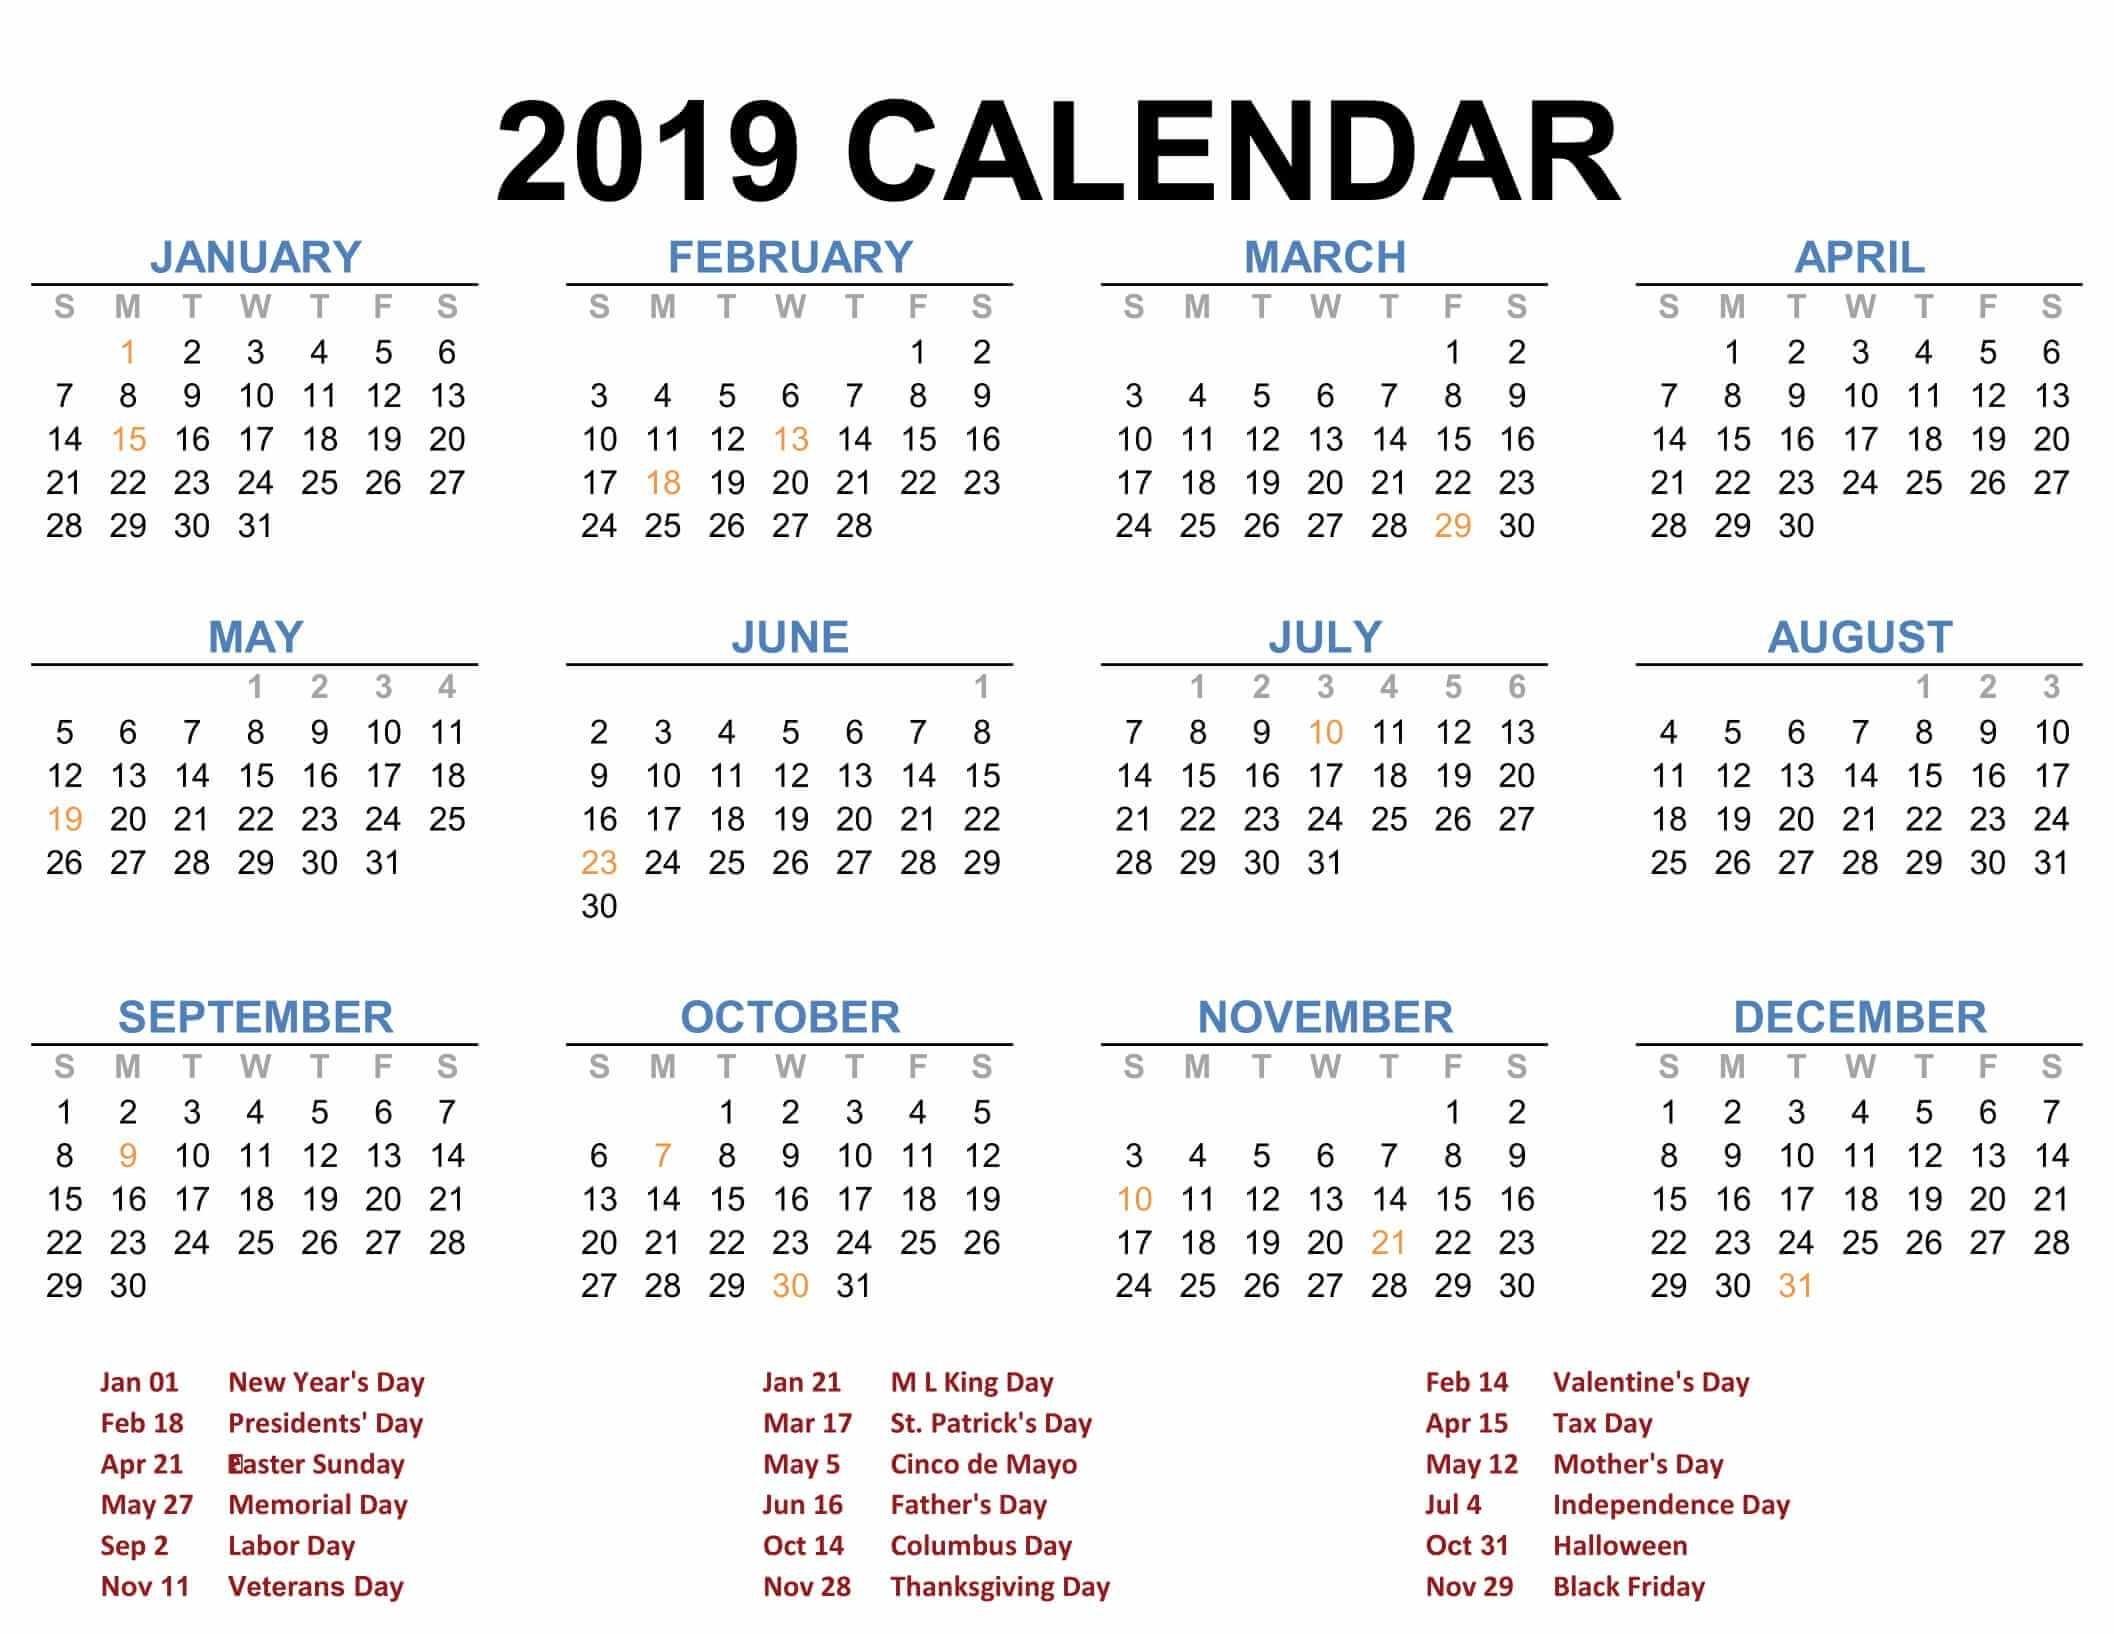 2019 Printable Calendar Templates - Pdf Excel Word - Free